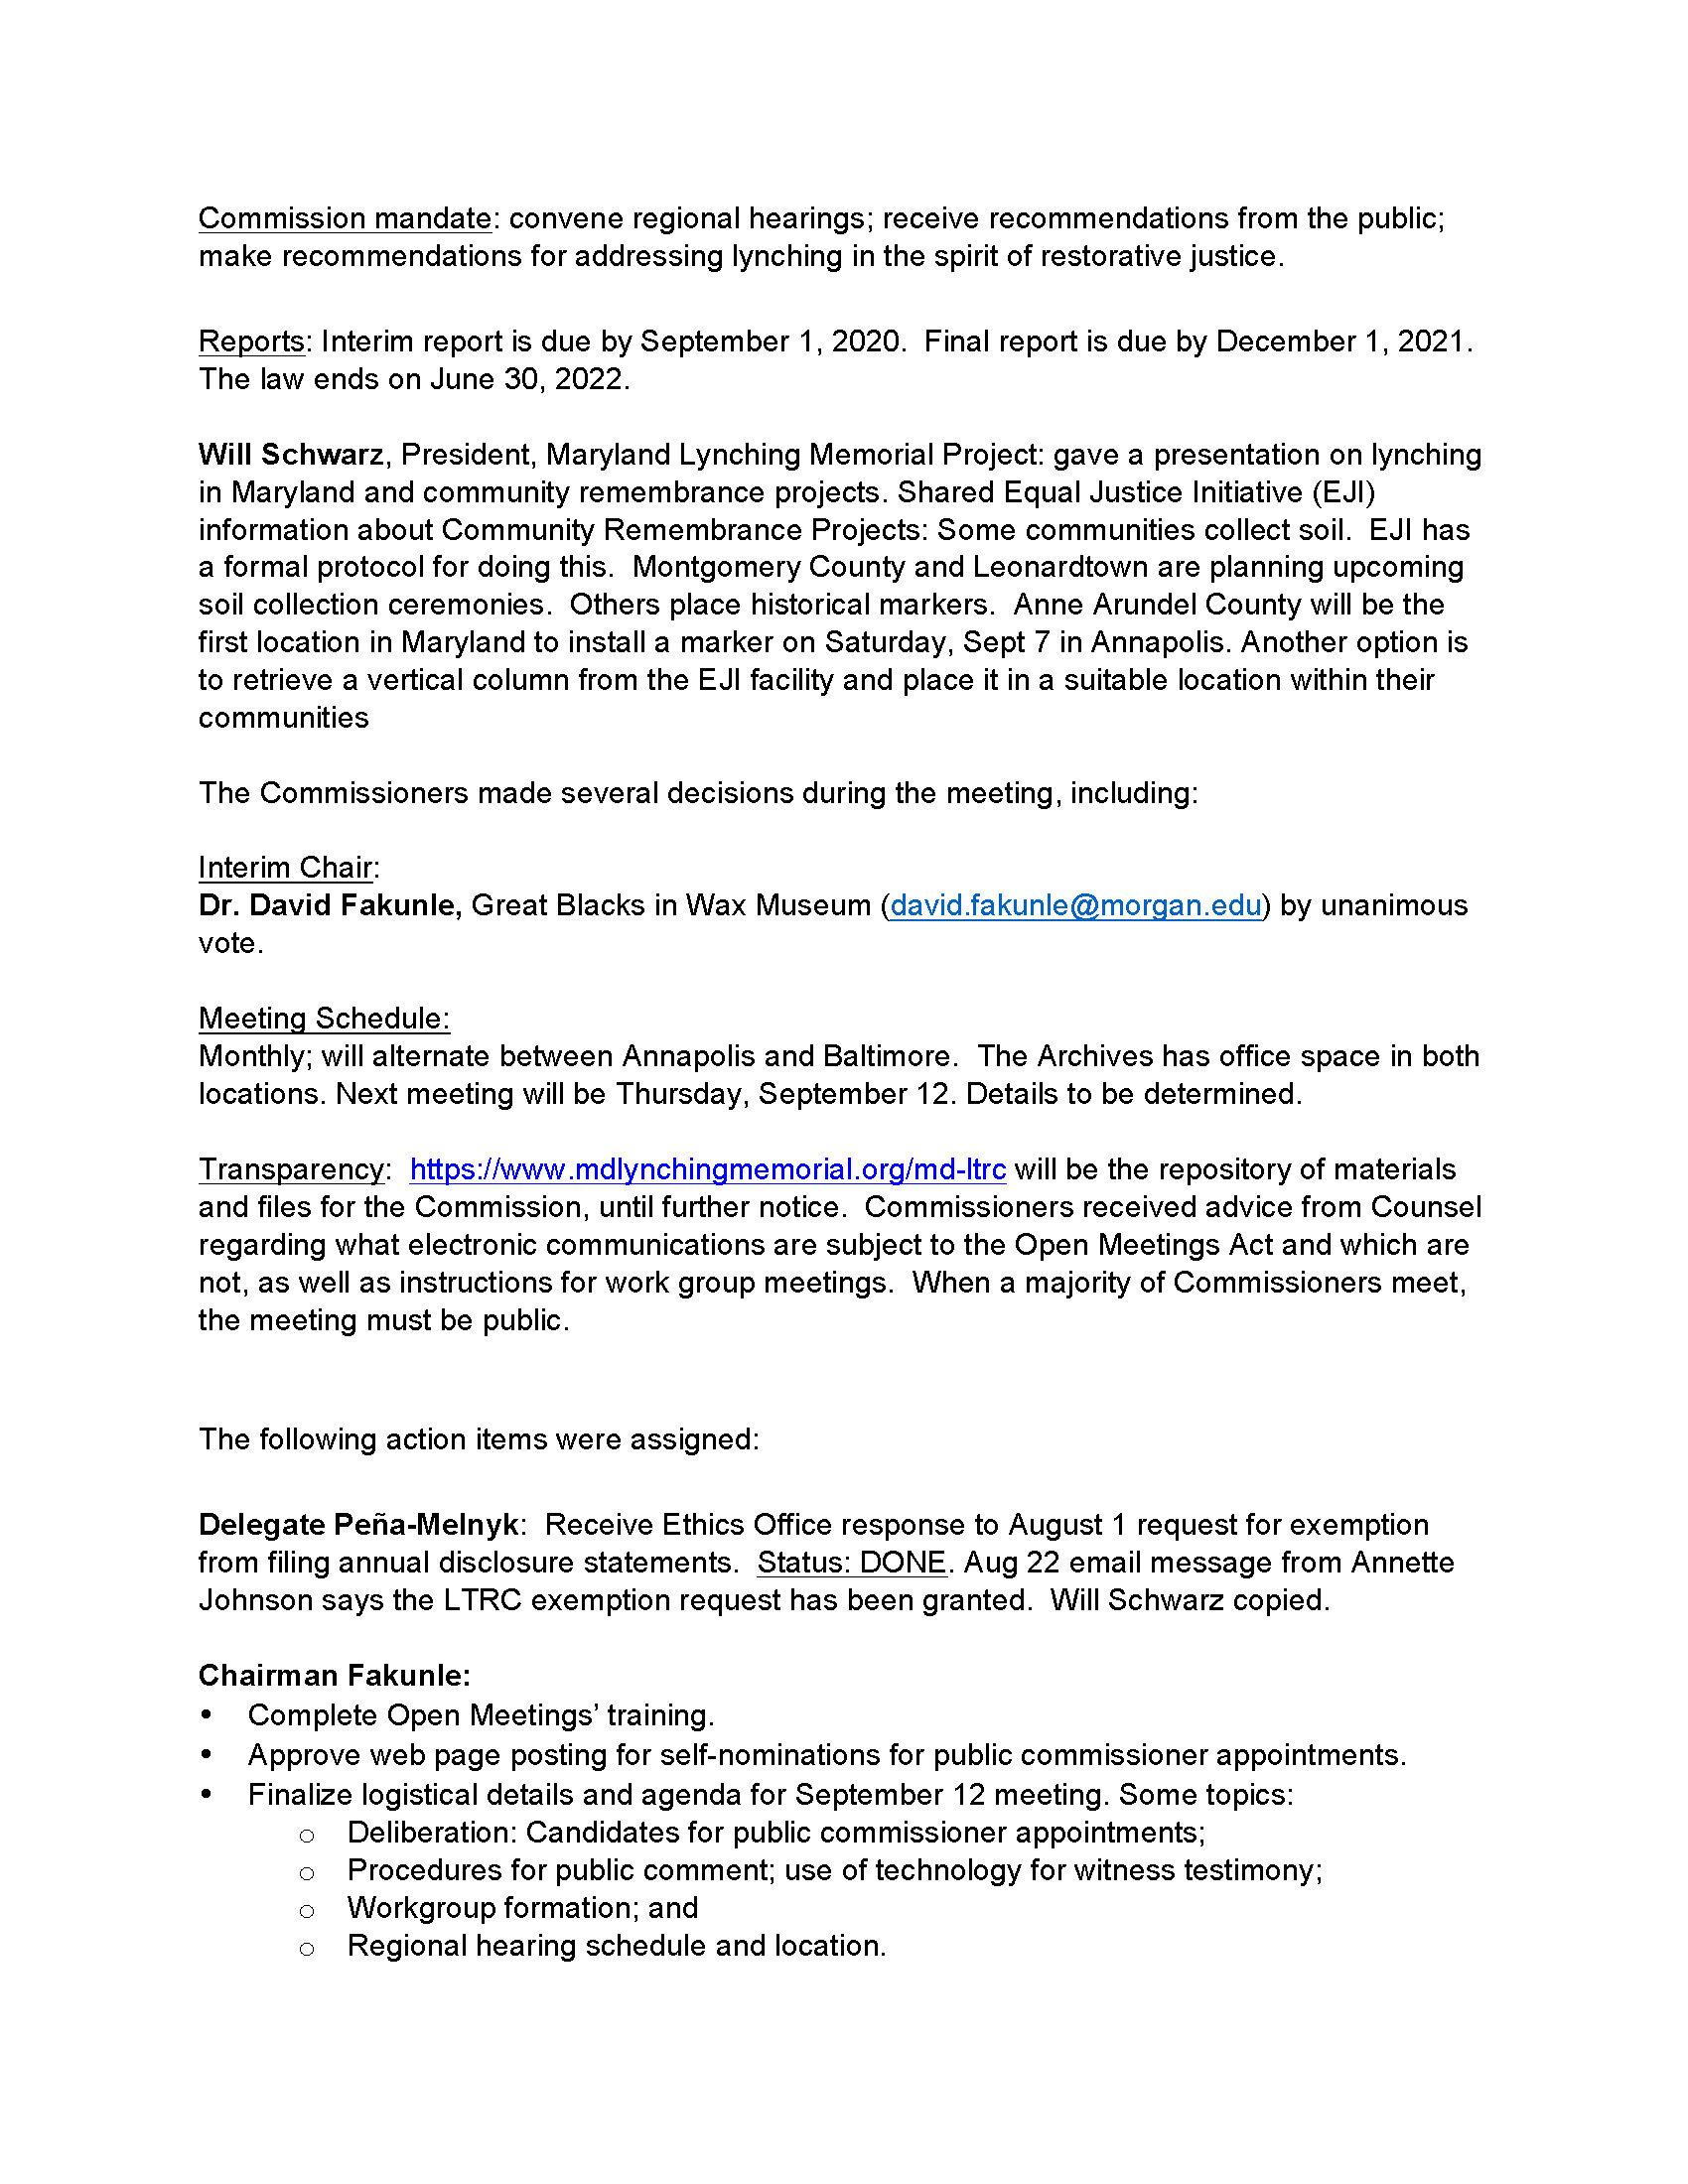 Meeting Minutes 8.07.19 FINAL_Page_2.jpg